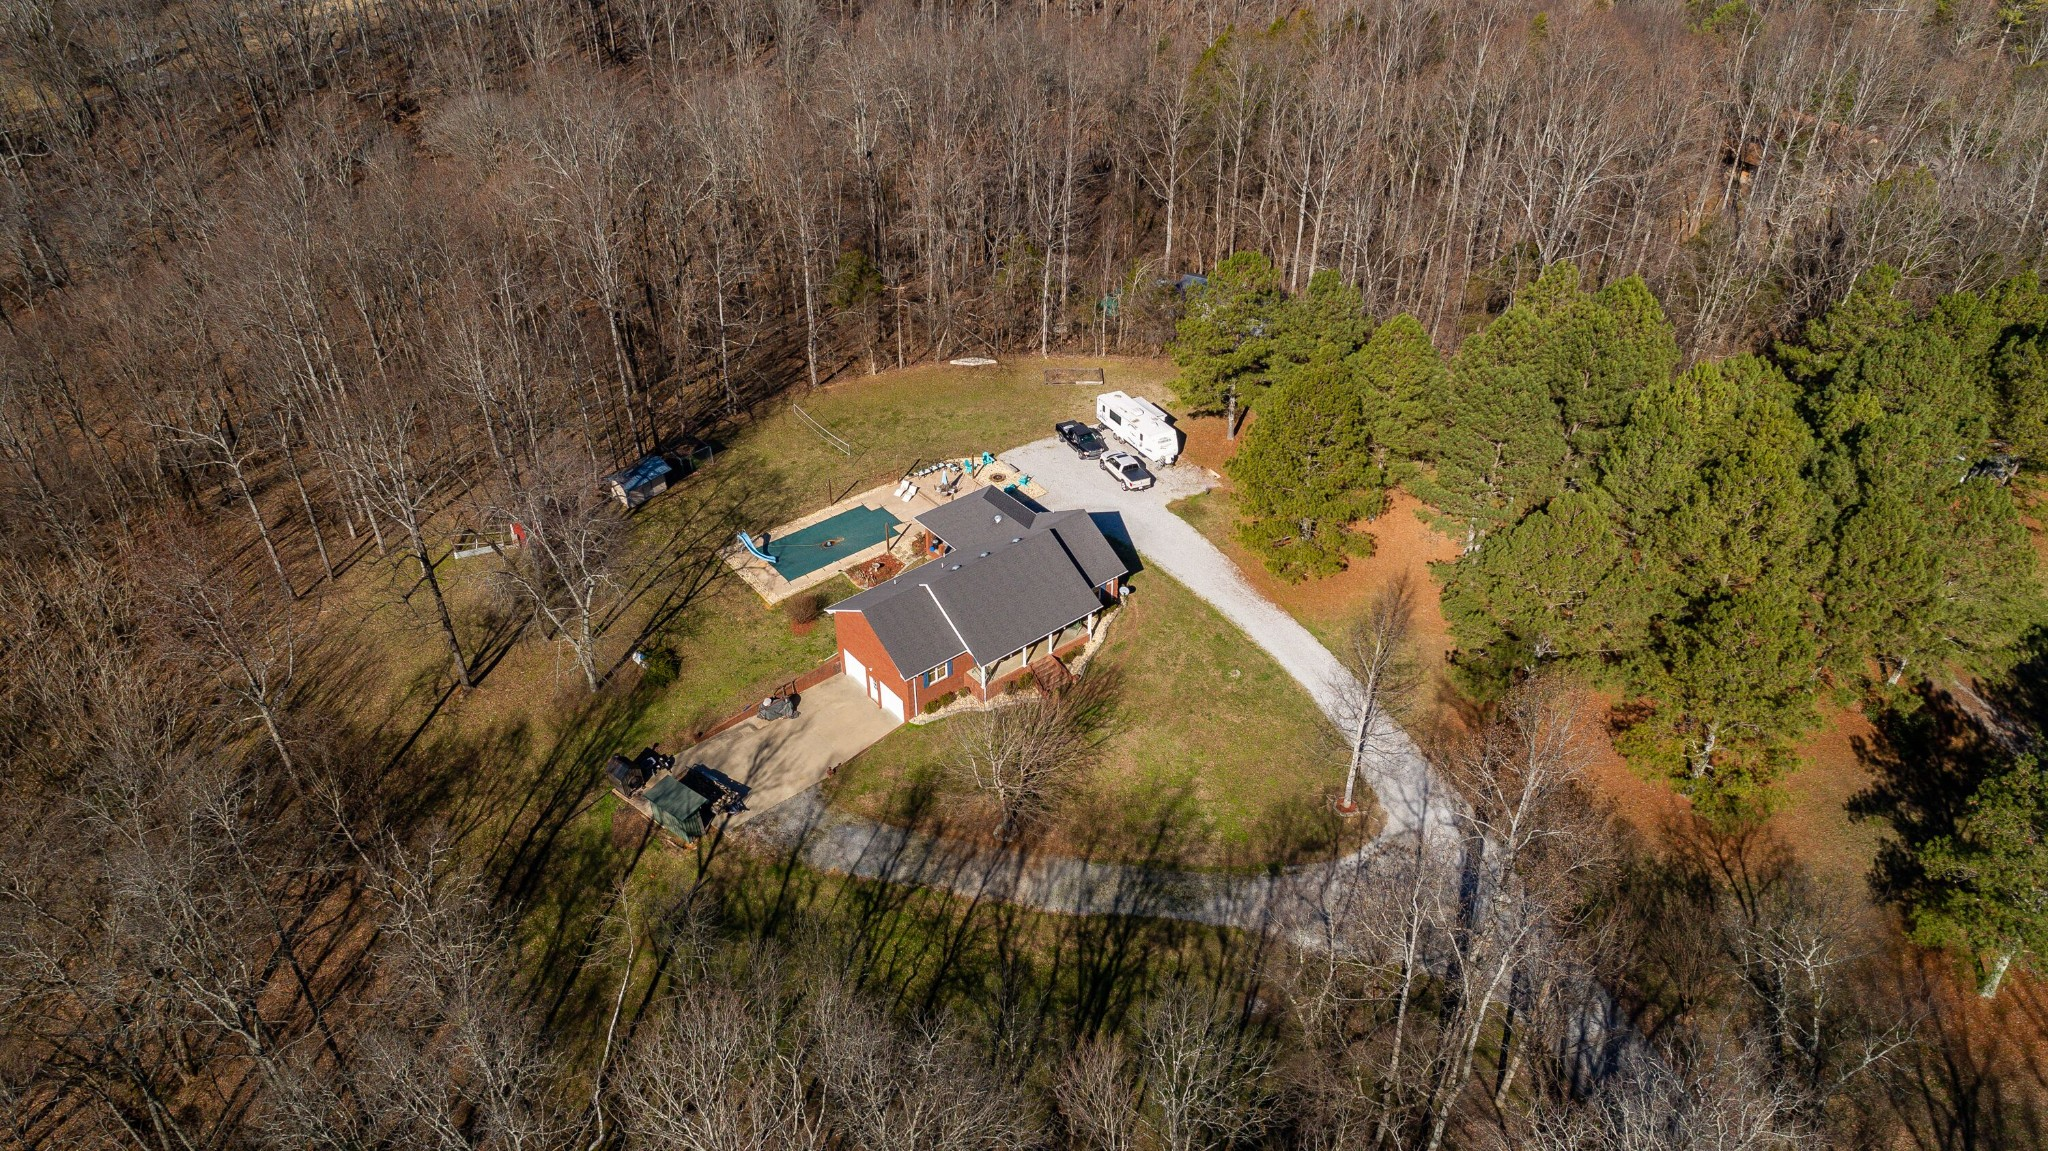 190 Clay Jones Rd, Taft, TN 38488 - Taft, TN real estate listing